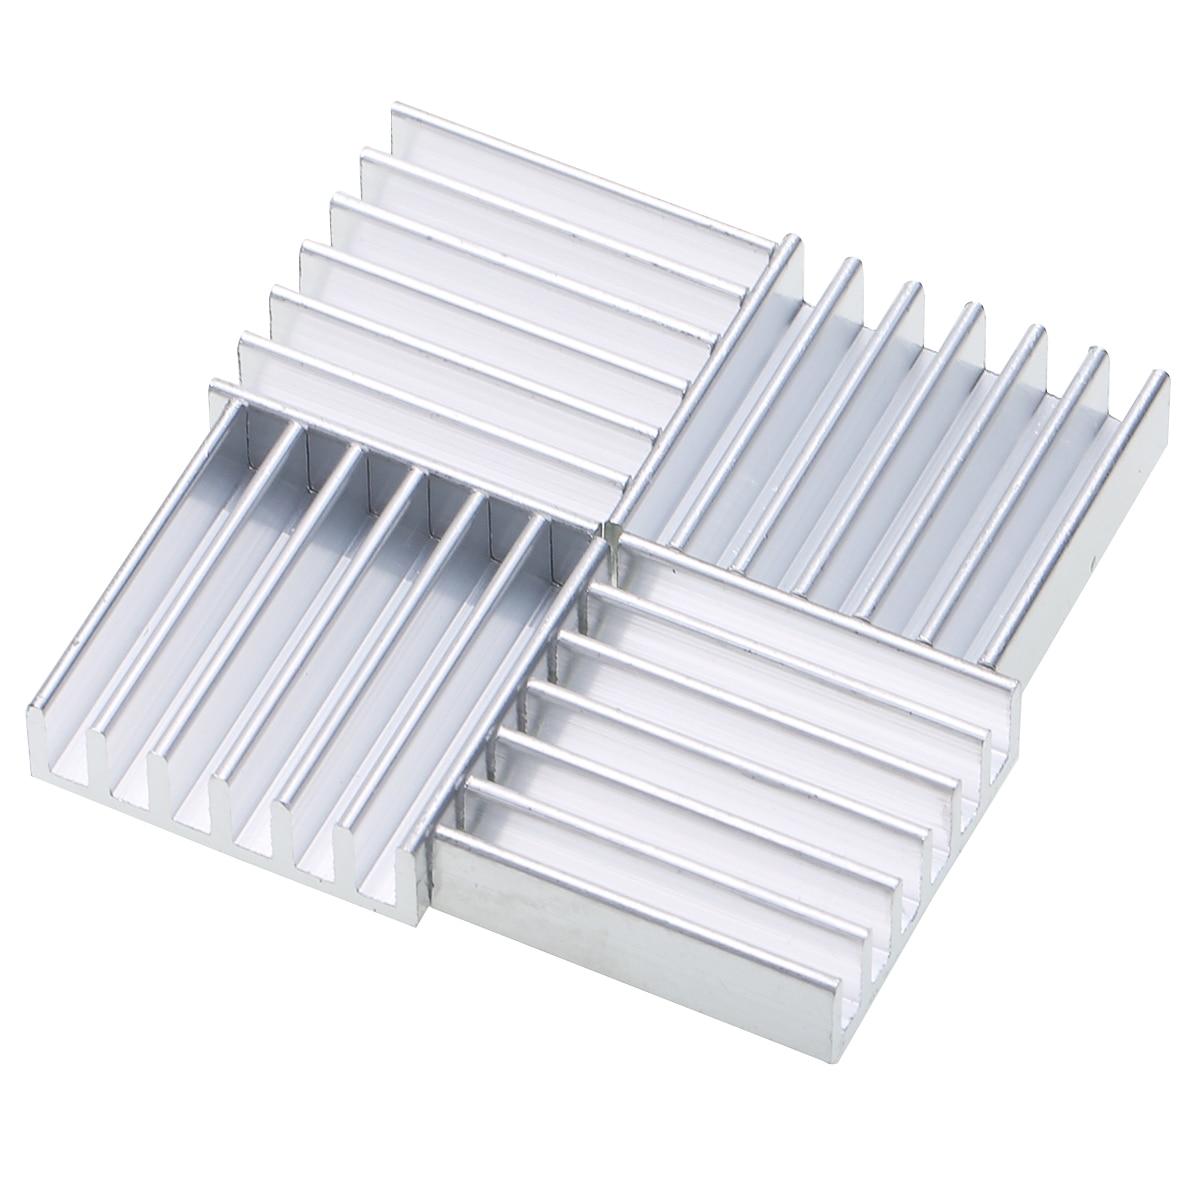 10pcs Heat Sink 20mm*20mm*6mm Mayitr Aluminum Heatsink Radiator for IC MOSFET SCR Power Transistor Voltage Regulator szytf 5pcs to 247 heatsink audio heatsink transistor heat sink block 38 34 12mm